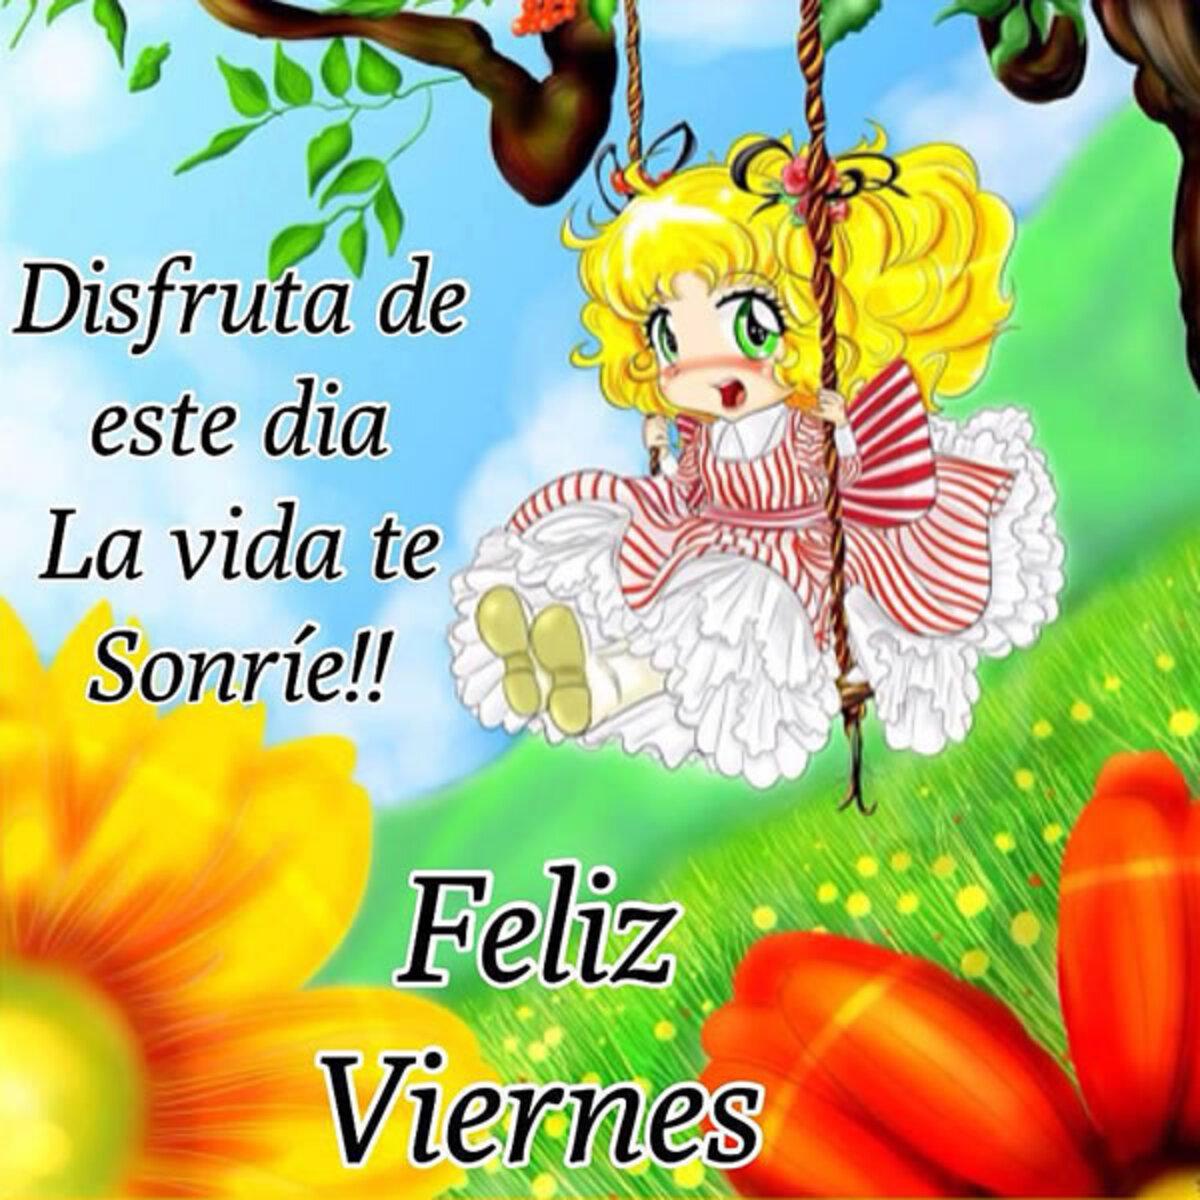 Disfruta este dia la vida te sonrie!! Feliz Viernes